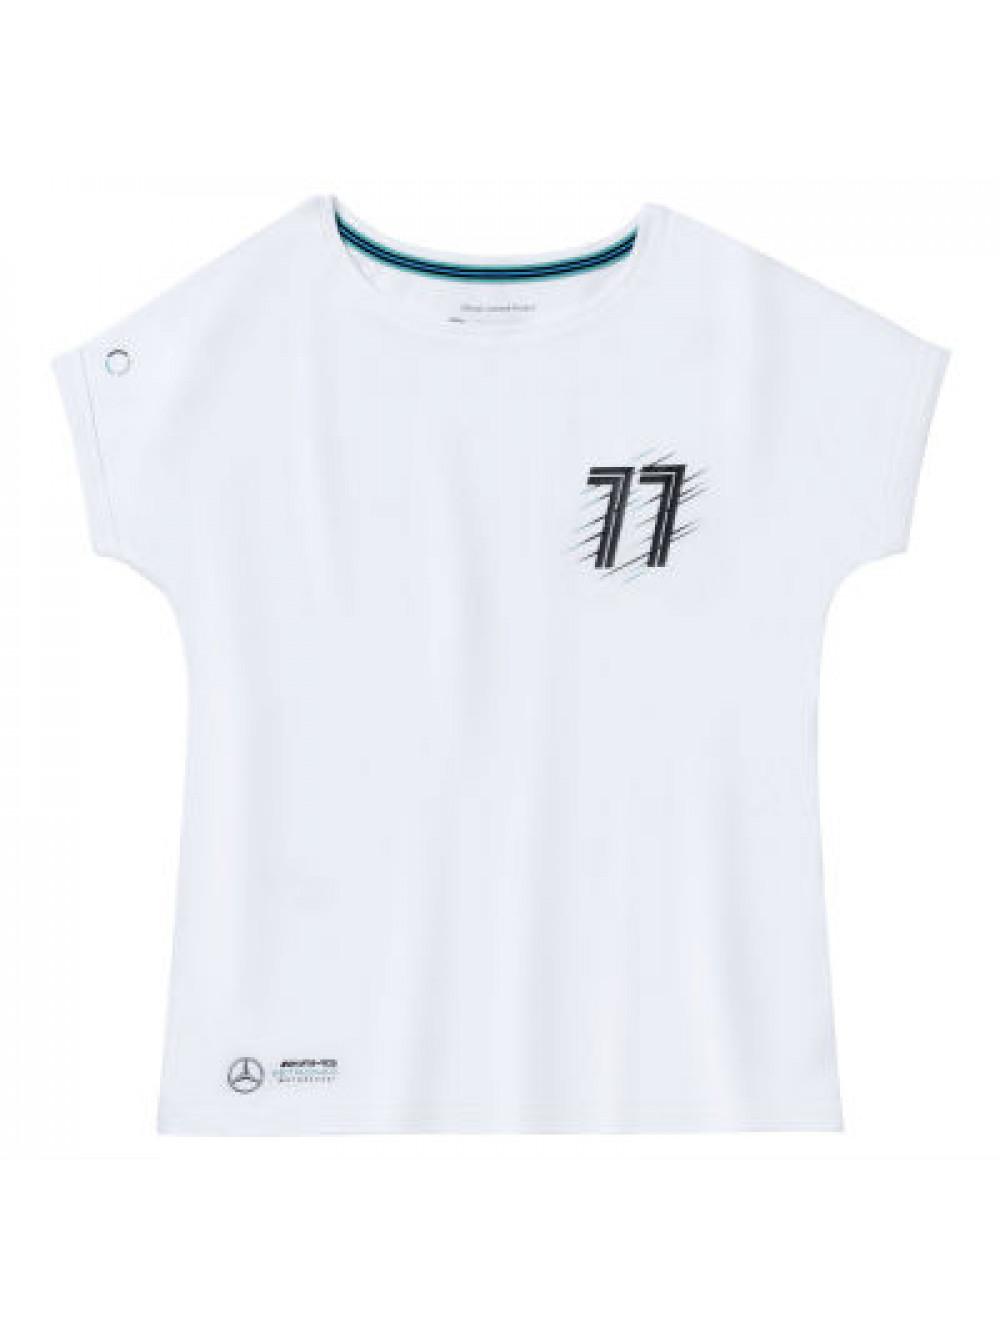 Женская футболка Mercedes AMG Petronas Women's T-shirt, Valtteri Bottas, White S